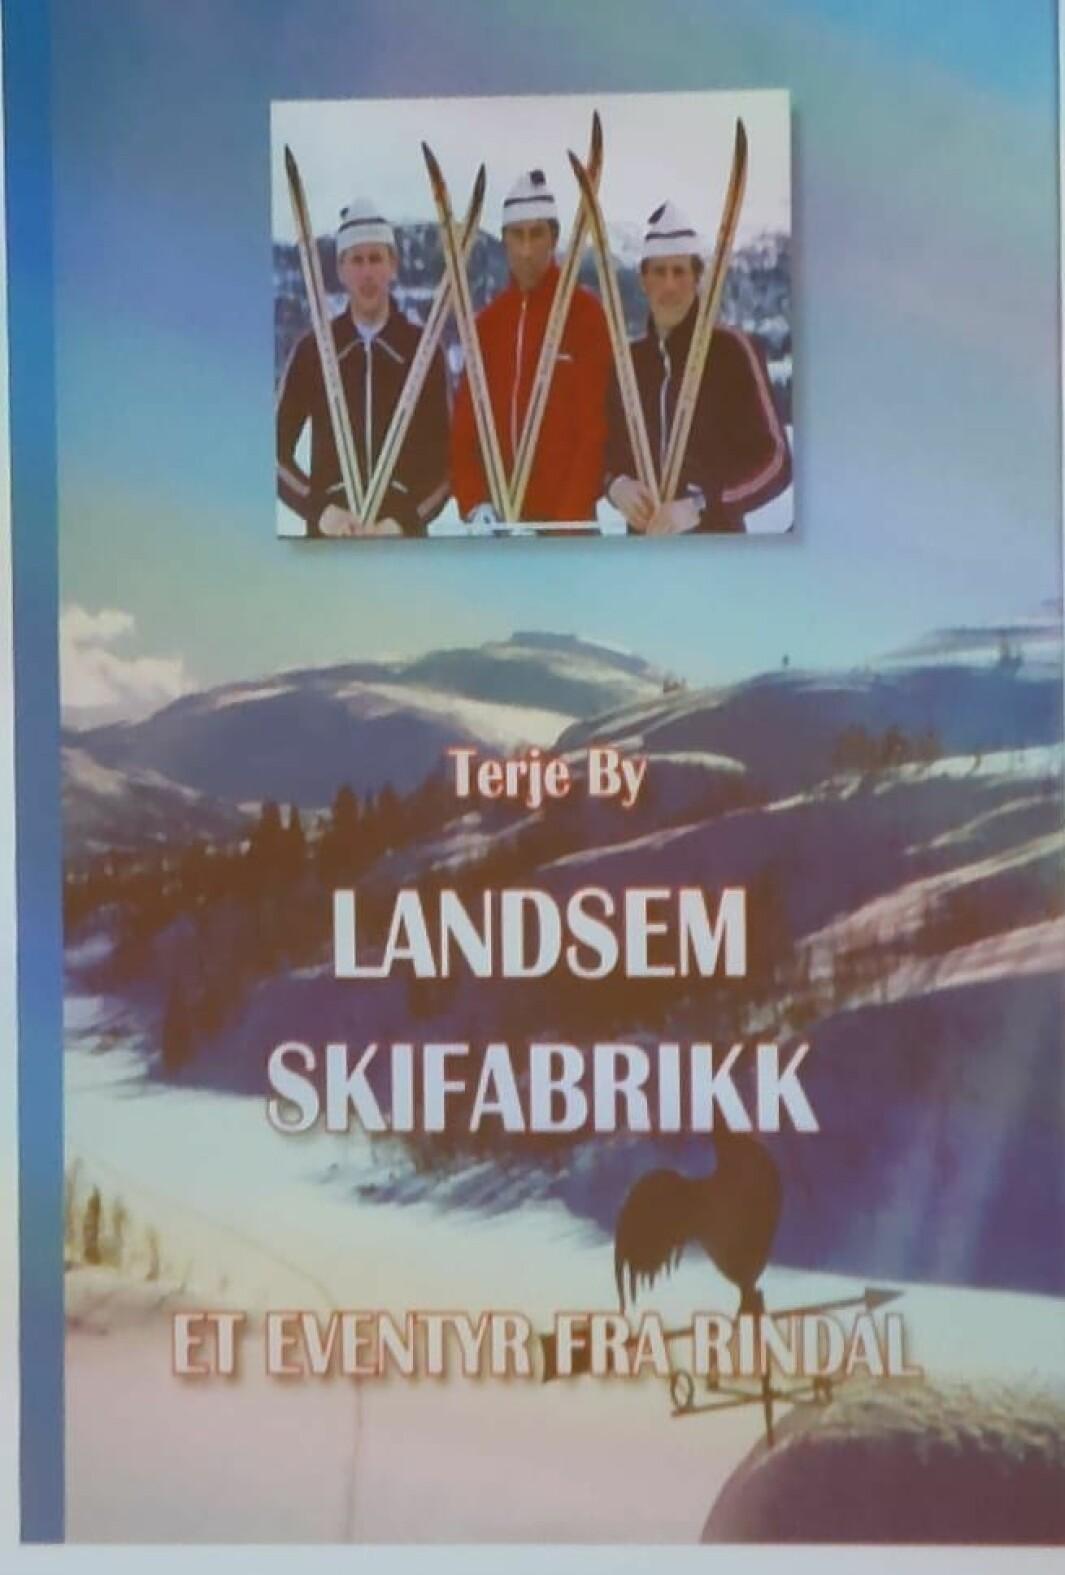 Omslaget til boka om Landsem skifabrikk